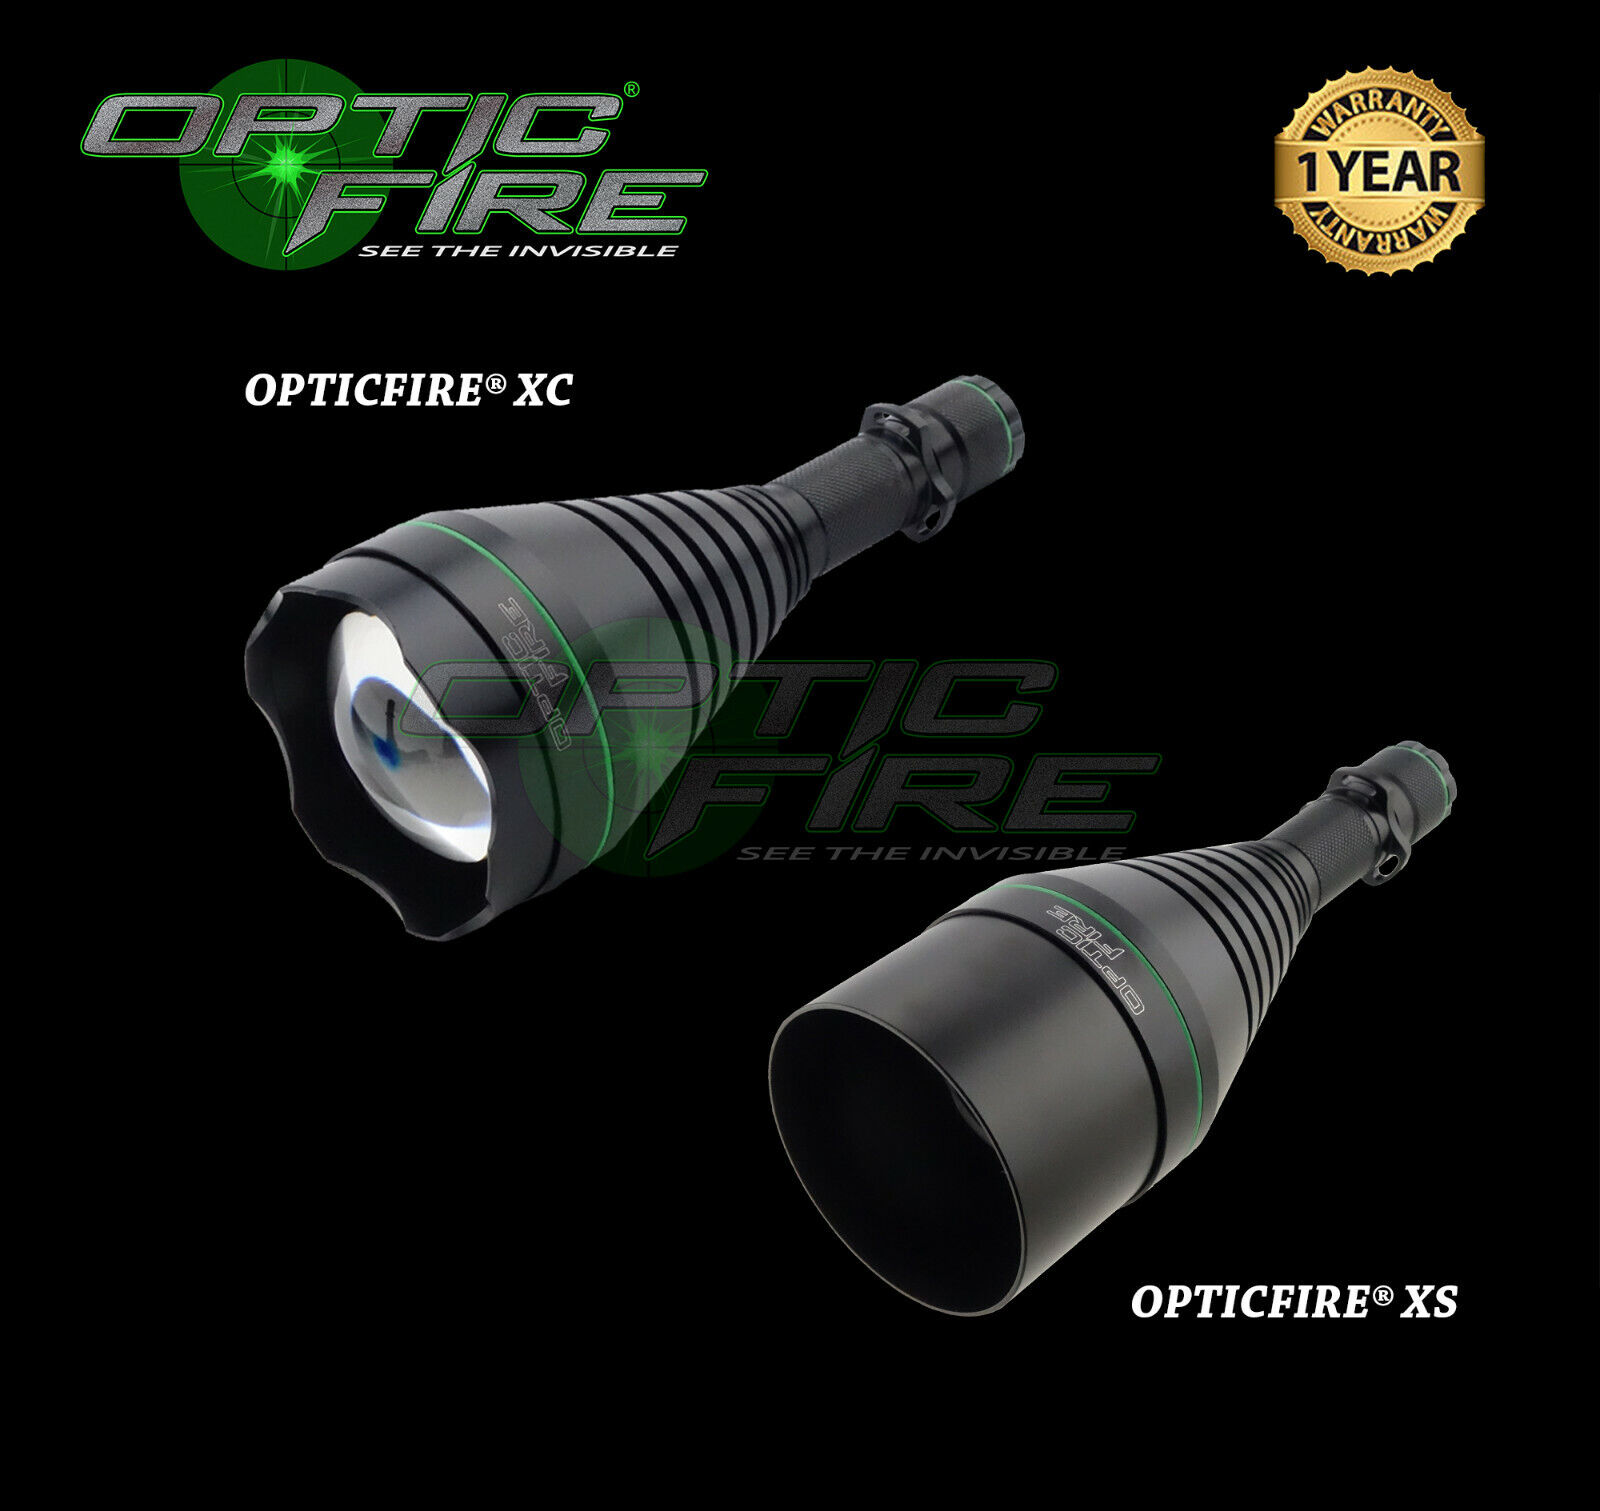 Opticfire® XC High power LED Hunting torch gun light scope mount lamping lamp